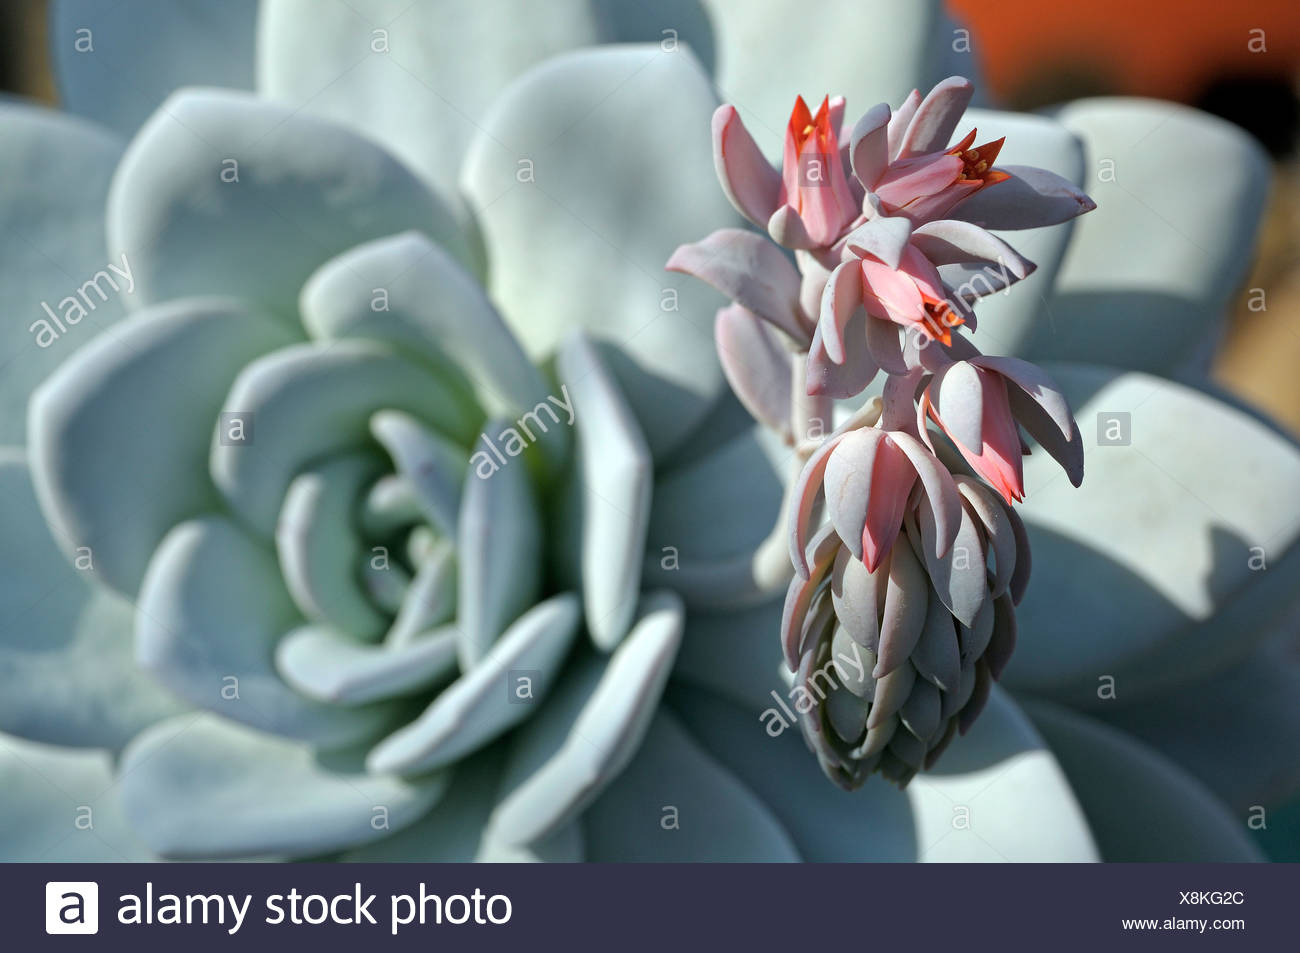 Echeverie (Echeveria laui) abloom Stock Photo